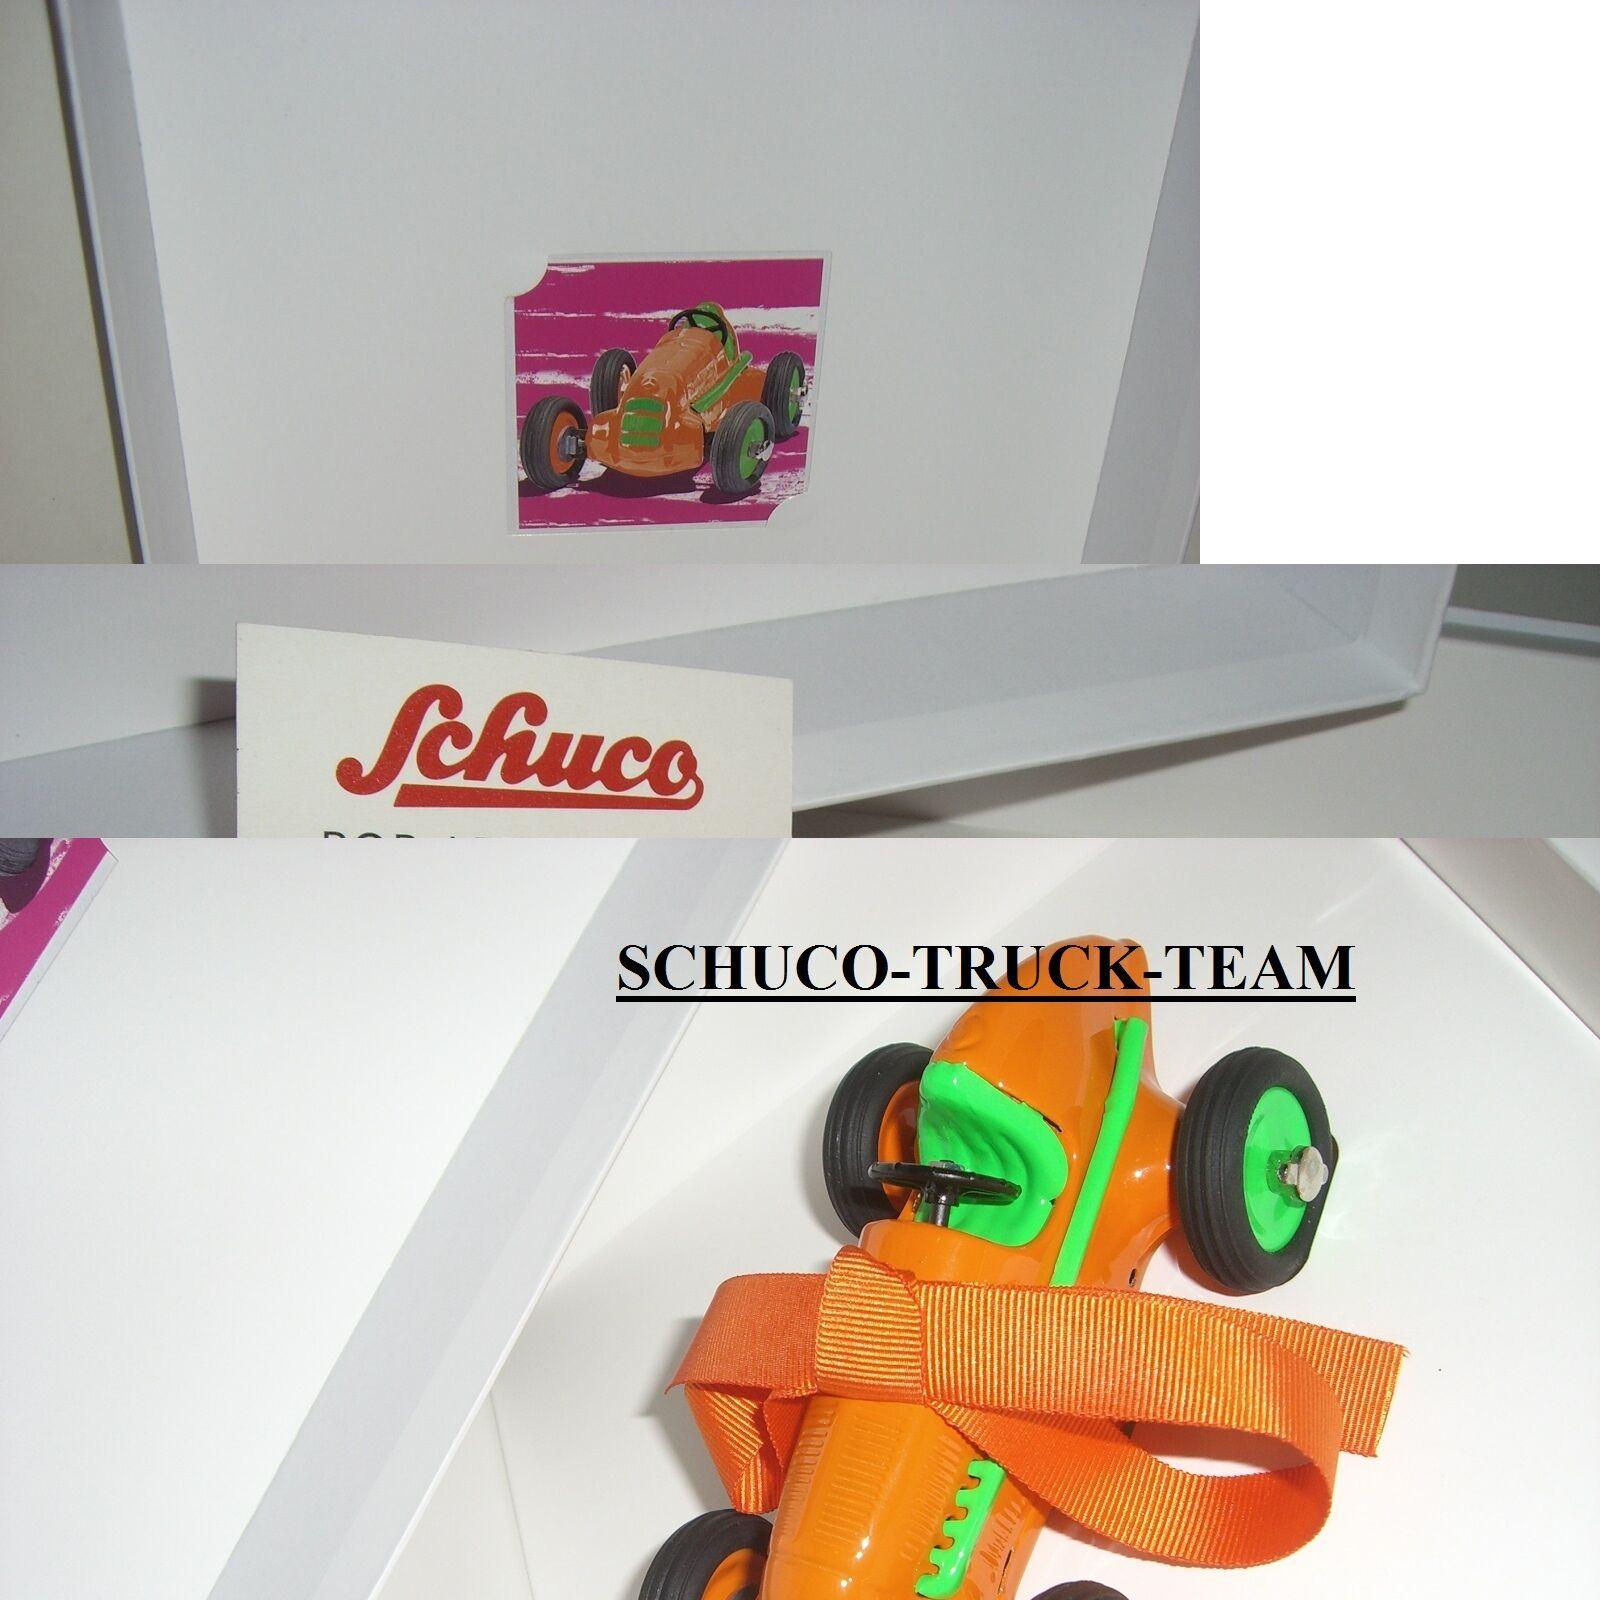 Schuco klassischer studio - pop - art - 0439 arancione 01114 edizione.